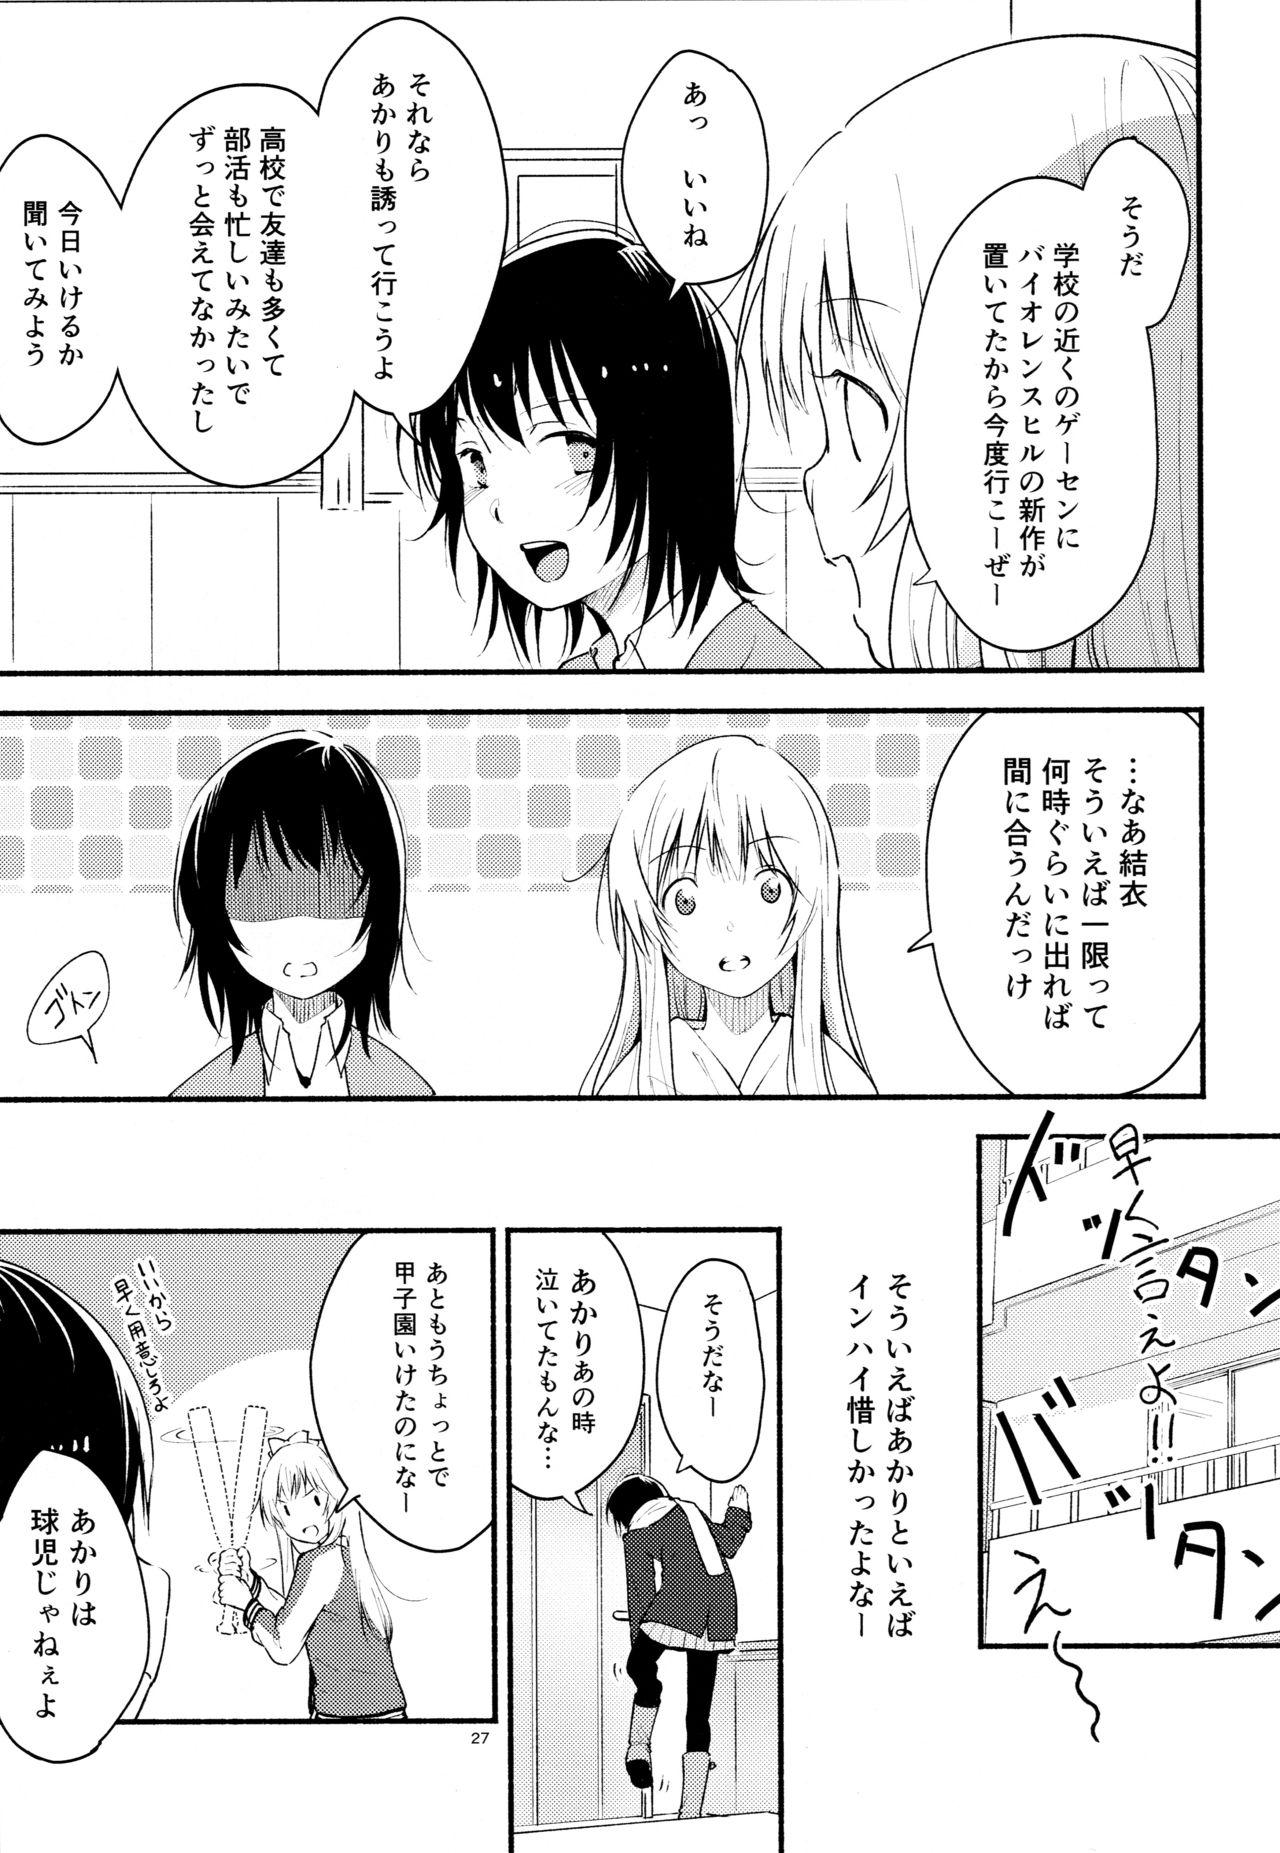 (Girls Love Festival 16) [G-complex (YUI_7)] Kyou mo Ashita mo Yurui Hibi o - Yui and Kyoko and forever loose day-to-day (YuruYuri) 25